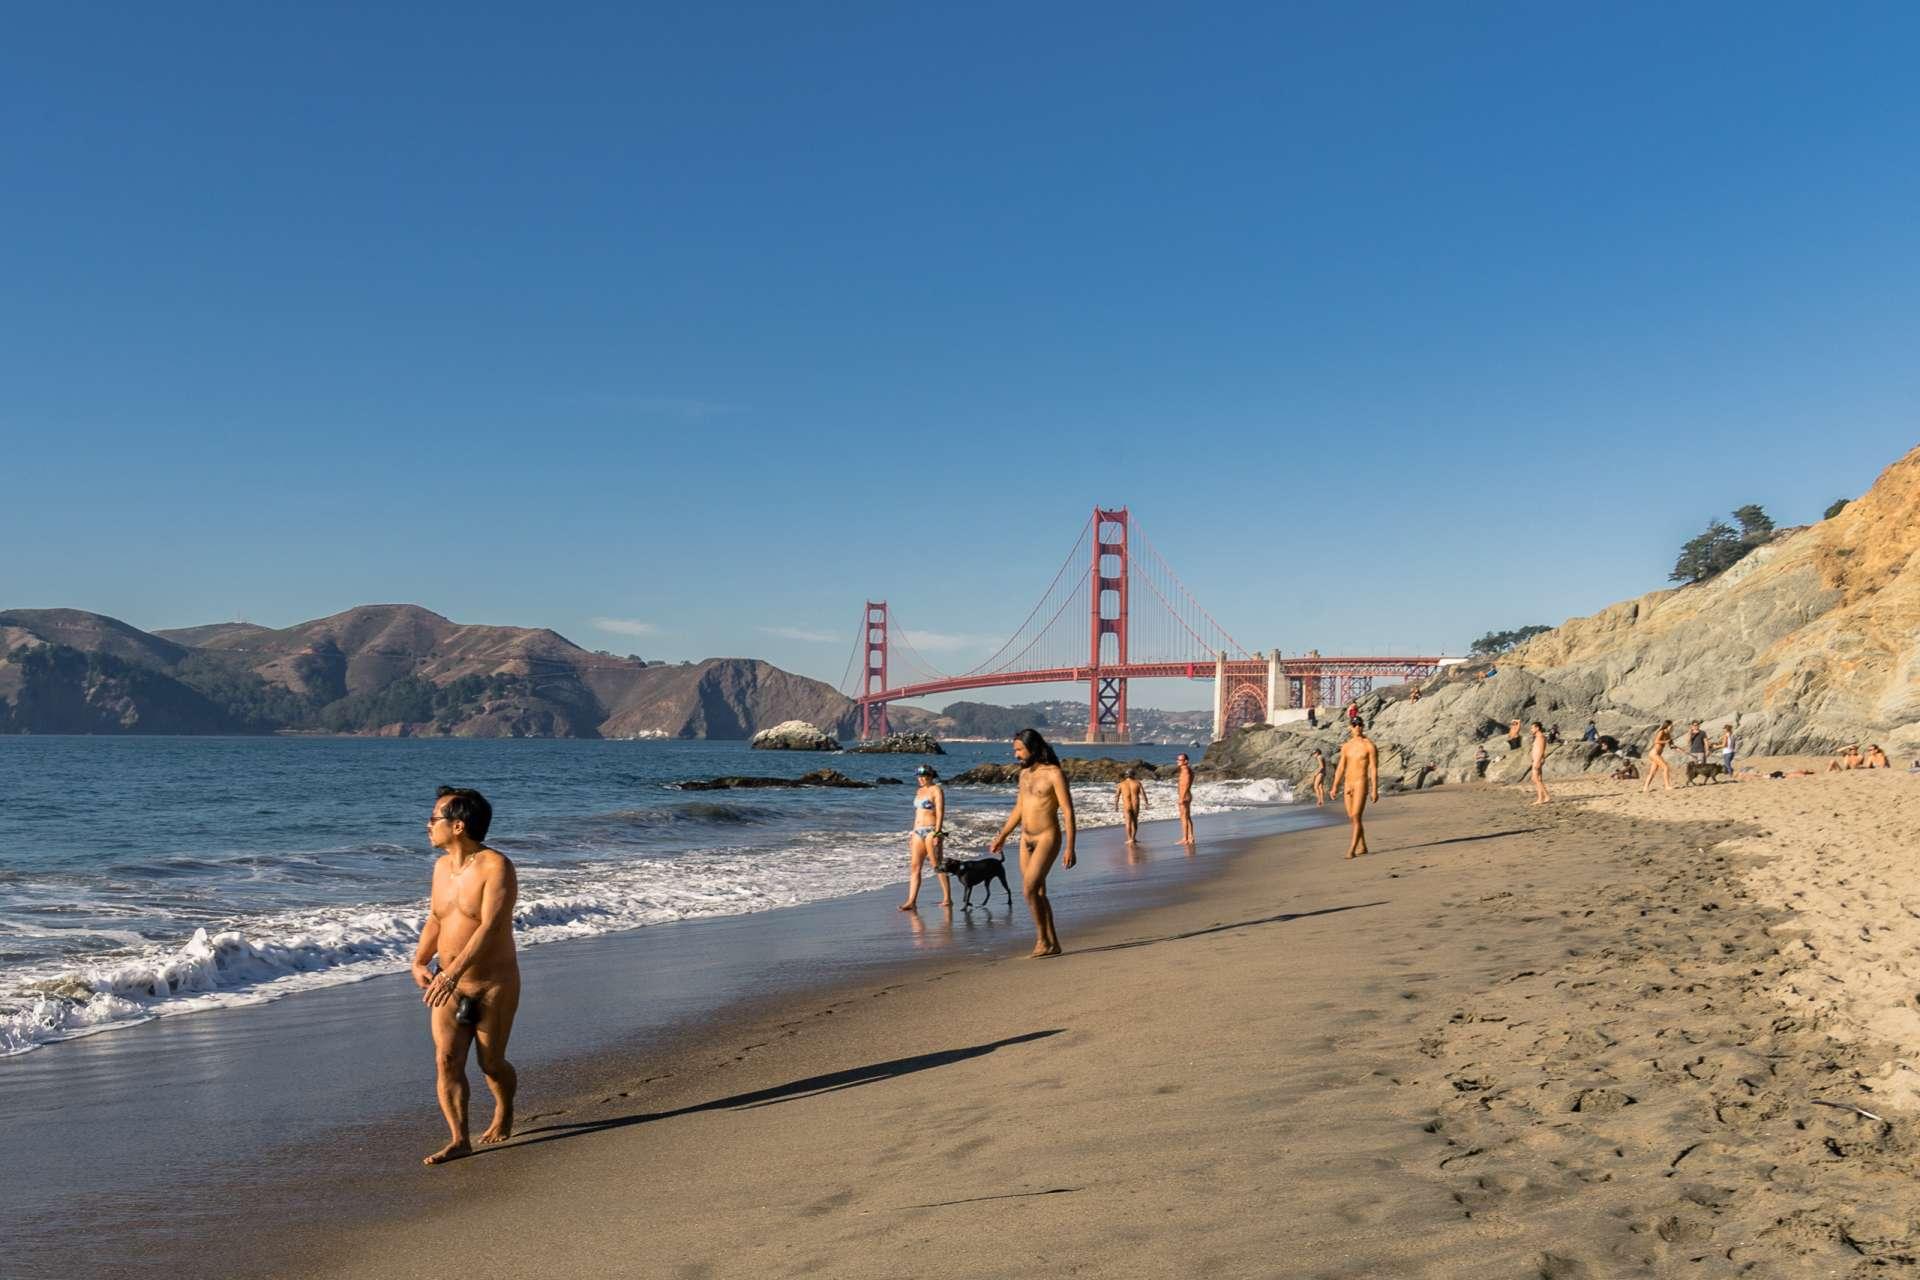 San diego beaches nude